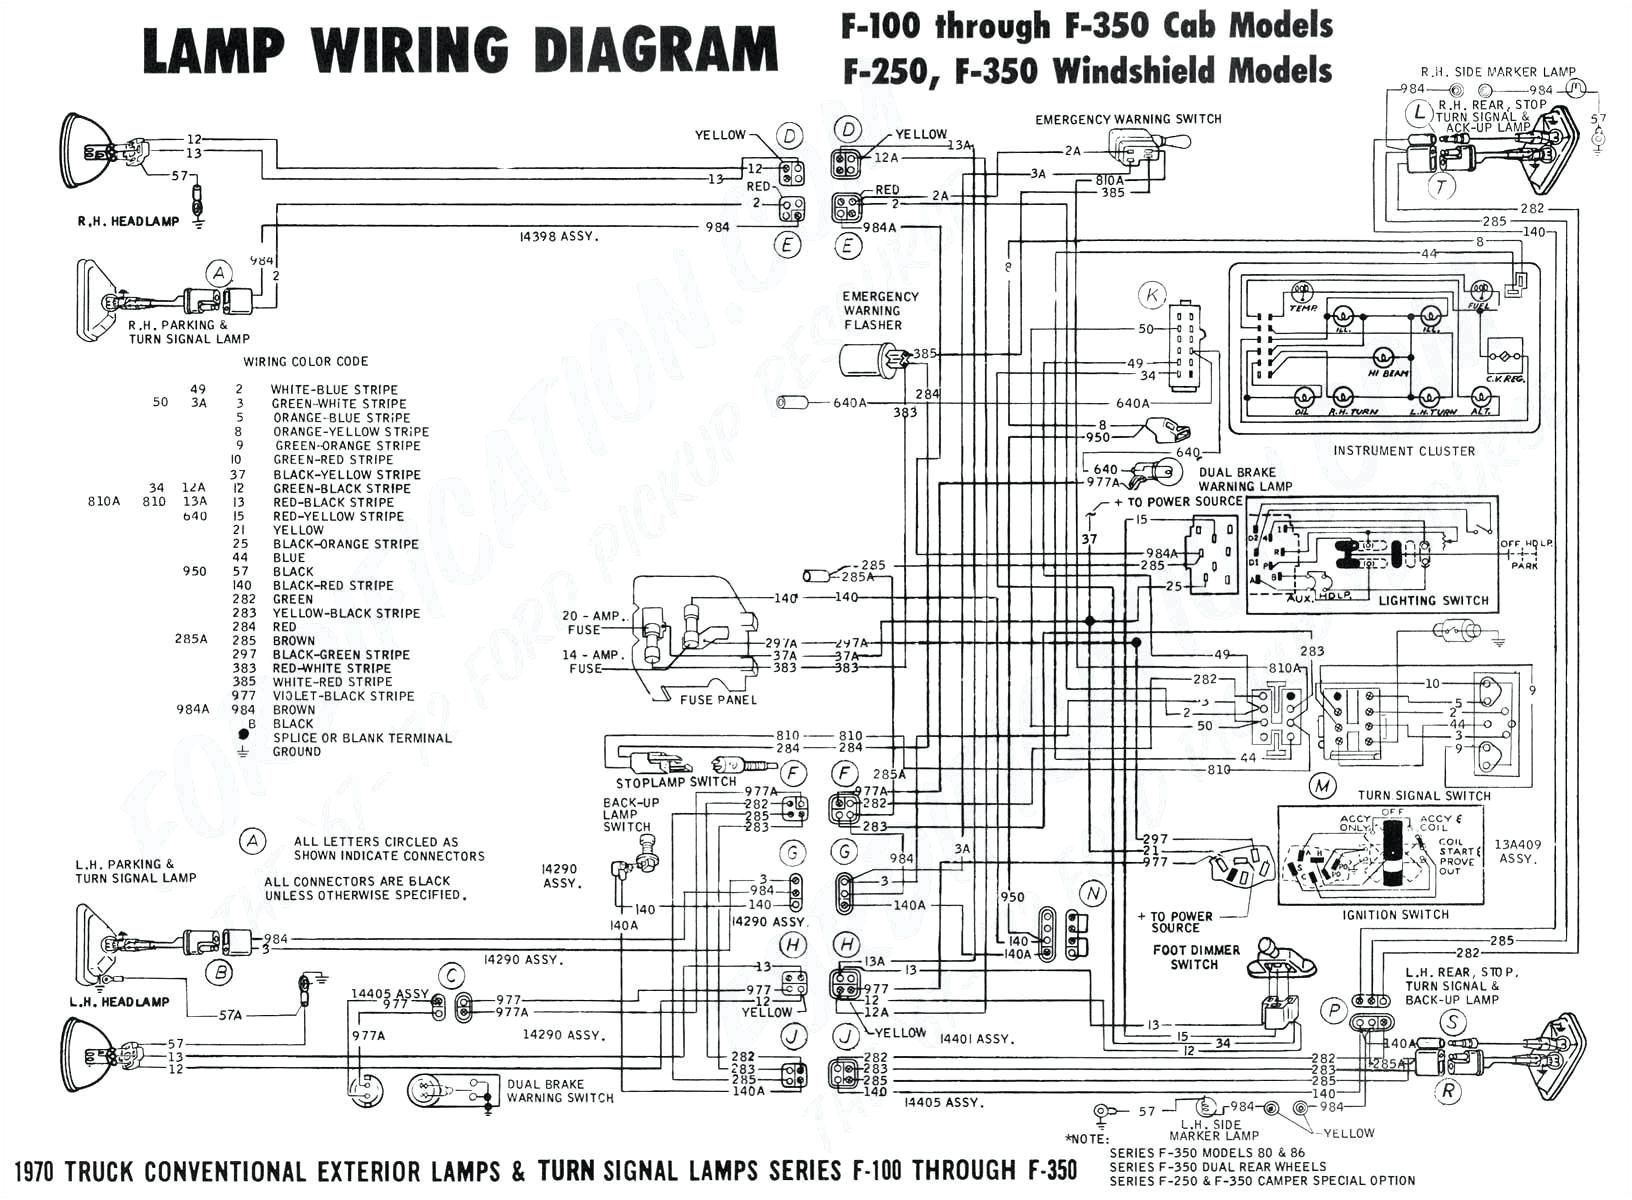 diagram clifford wiring alarms b134718b wiring diagram new code alarm ca1051 wiring diagram b2 wiring harness